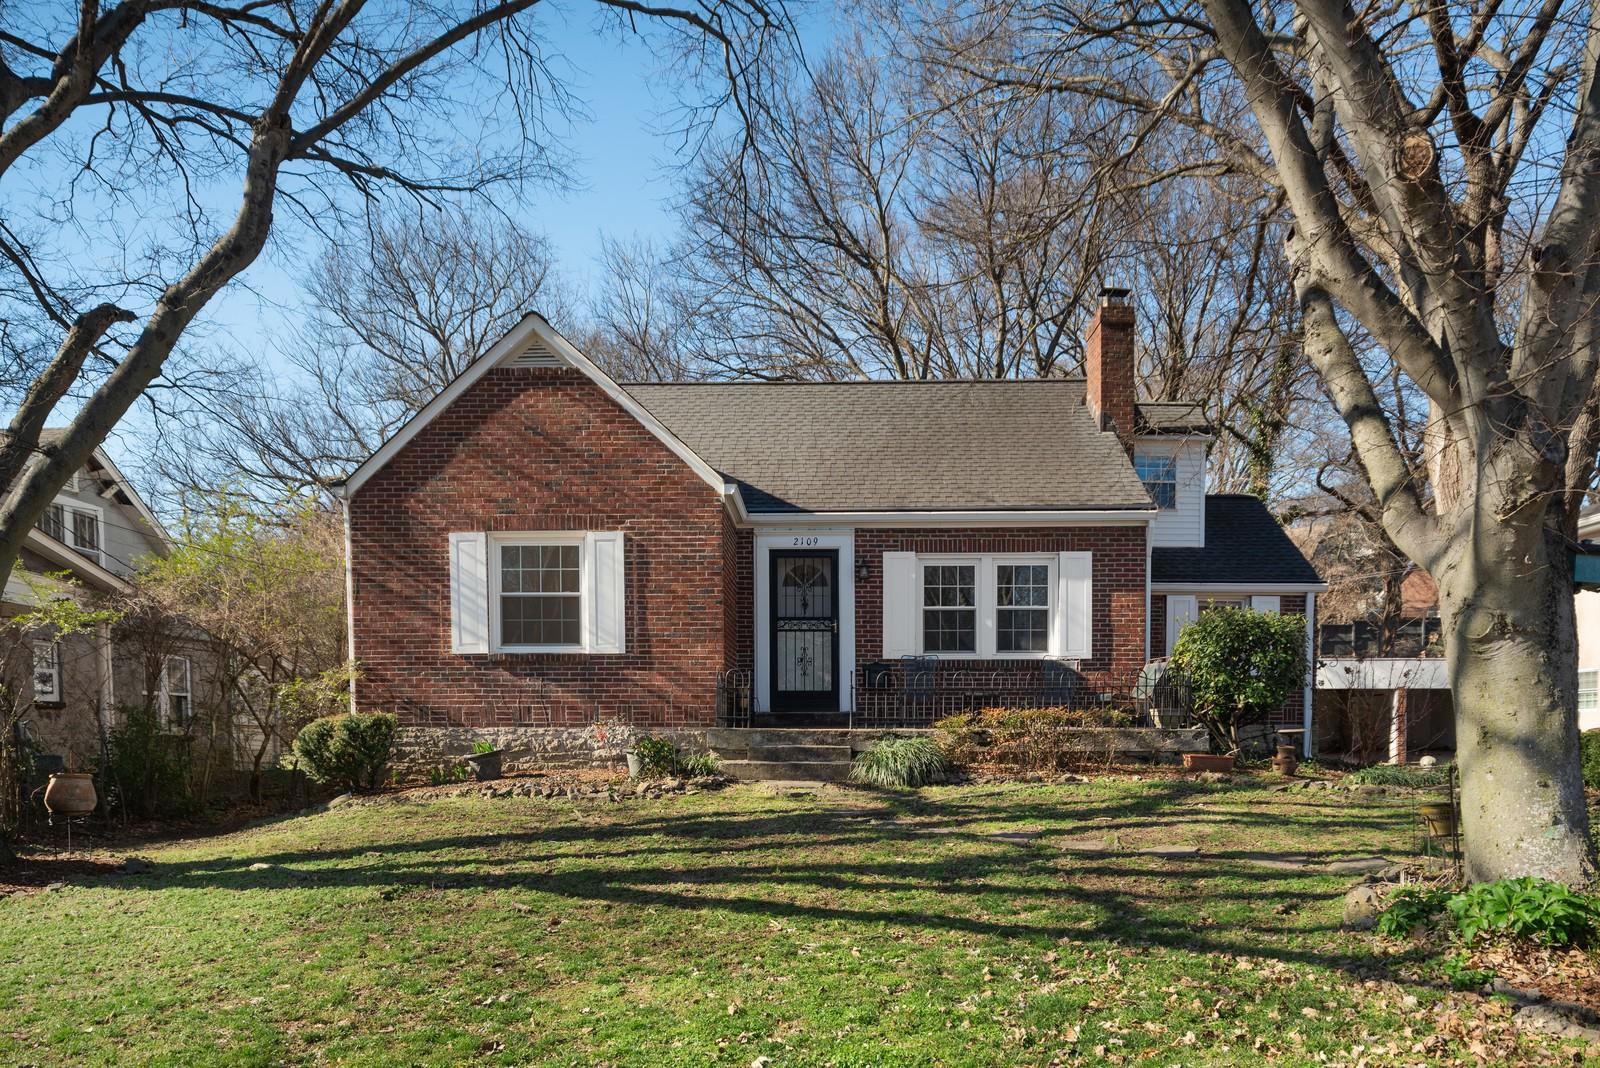 2109 Natchez Trce, Nashville, TN 37212 - Nashville, TN real estate listing